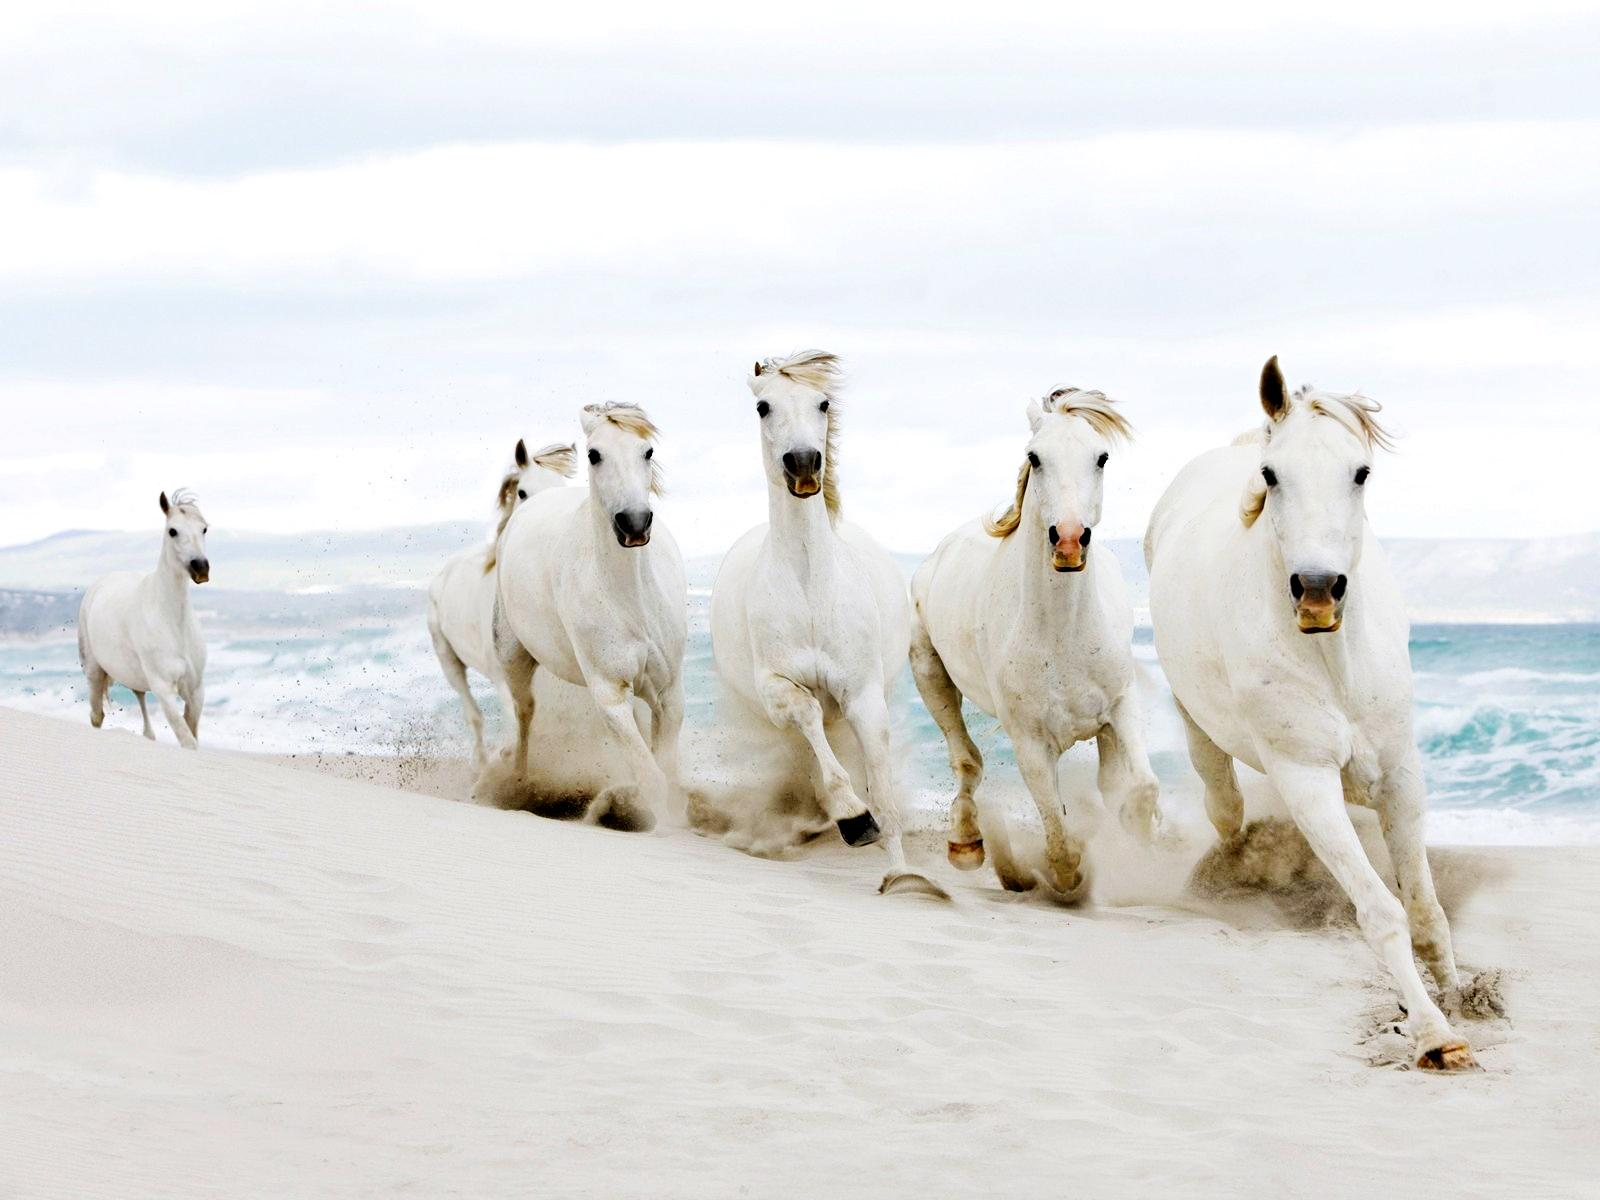 33 White Horse Running On Beach Wallpapers On Wallpapersafari